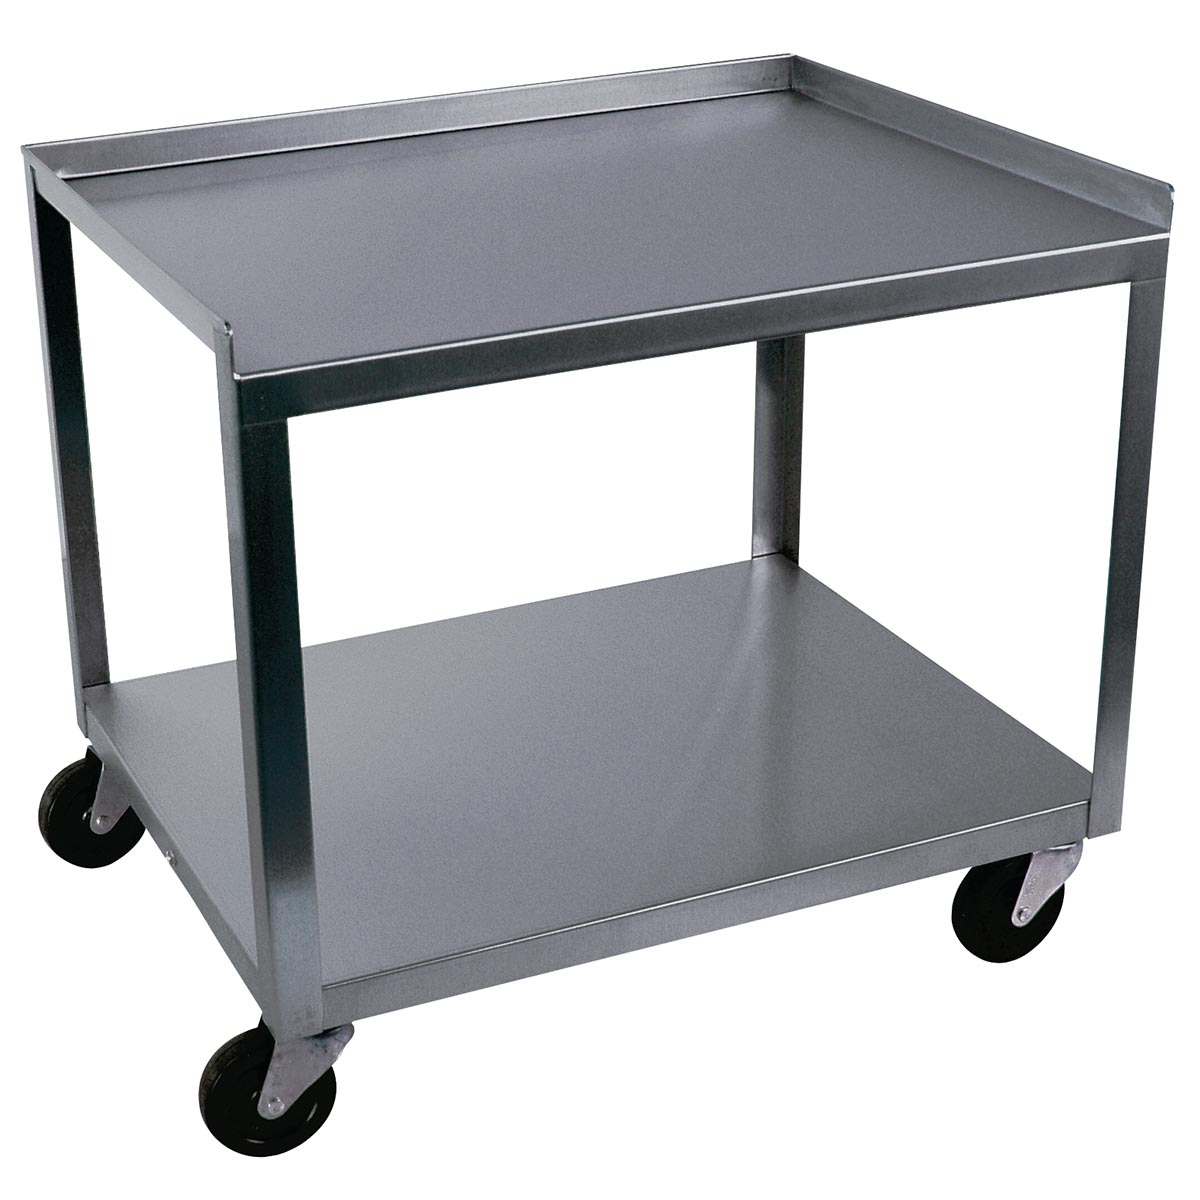 2 shelf stainless steel cart w56107 ideal mc221. Black Bedroom Furniture Sets. Home Design Ideas